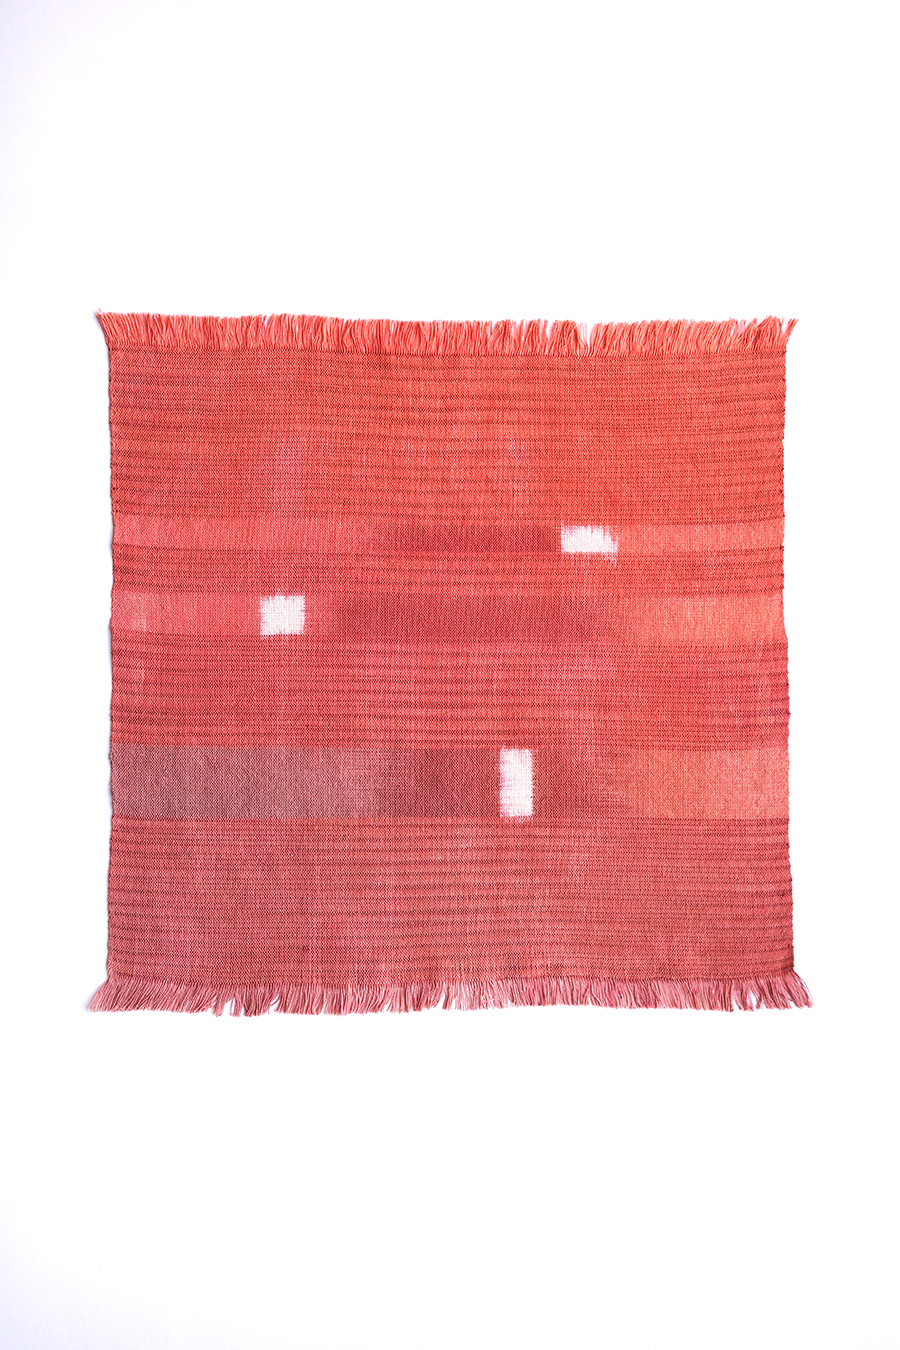 Red Clay   Cotton fibres 2015